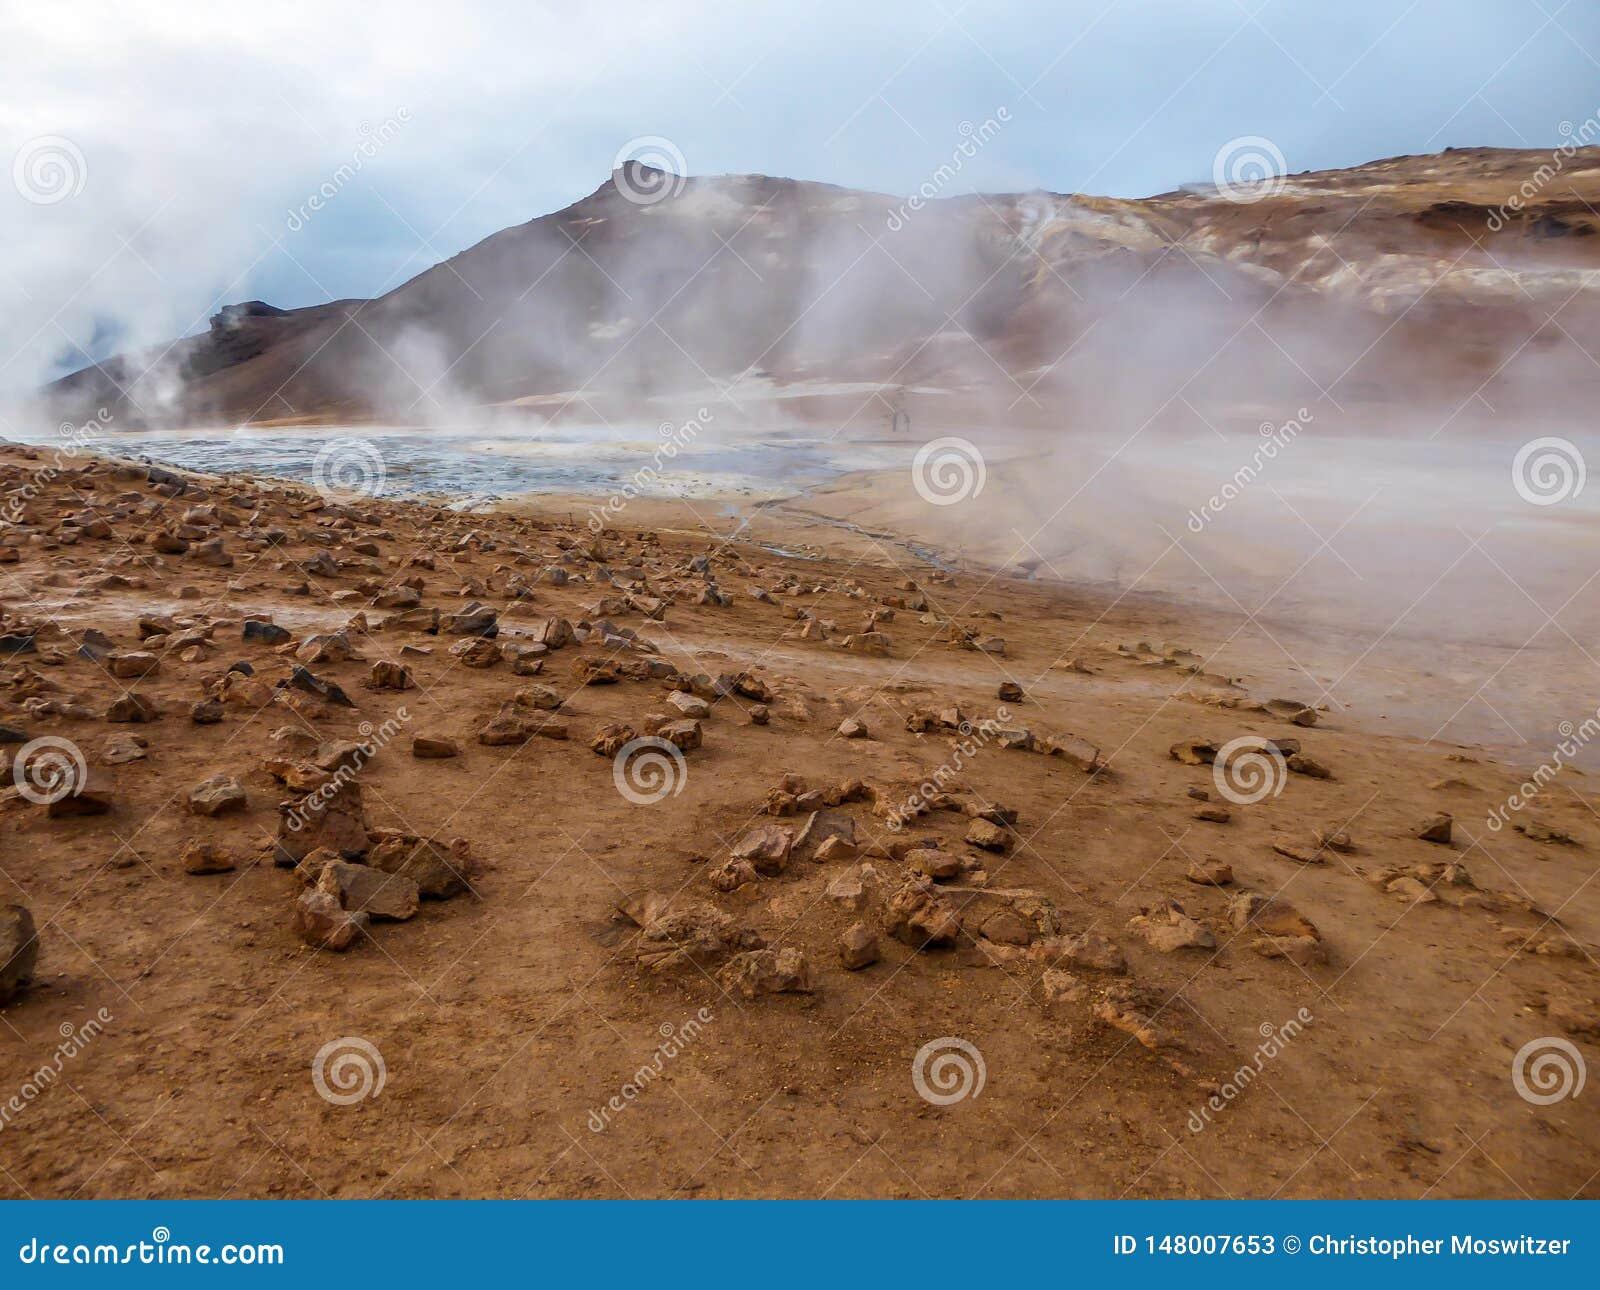 Iceland - Smoking hot pots at the geothermal activie region of Hverir